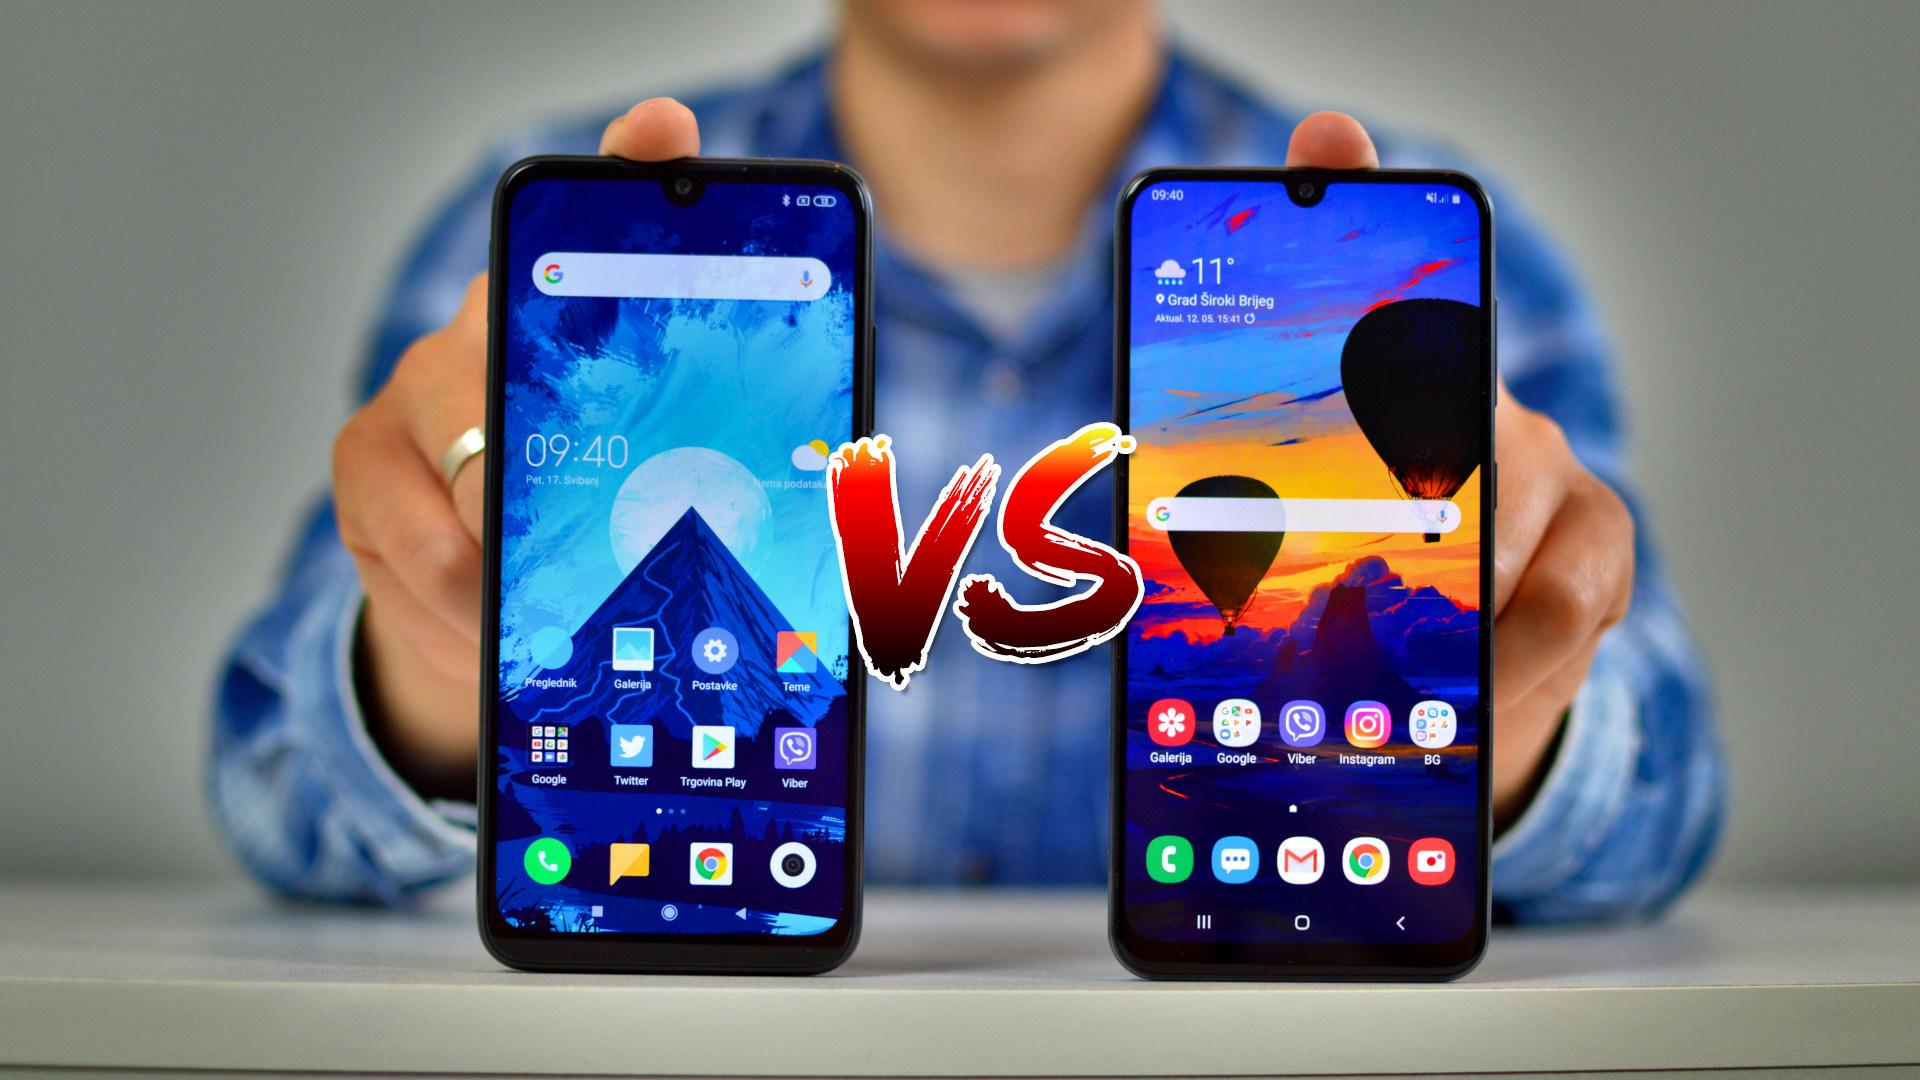 Usporedba Samsung Galaxy A50 vs Redmi Note 7